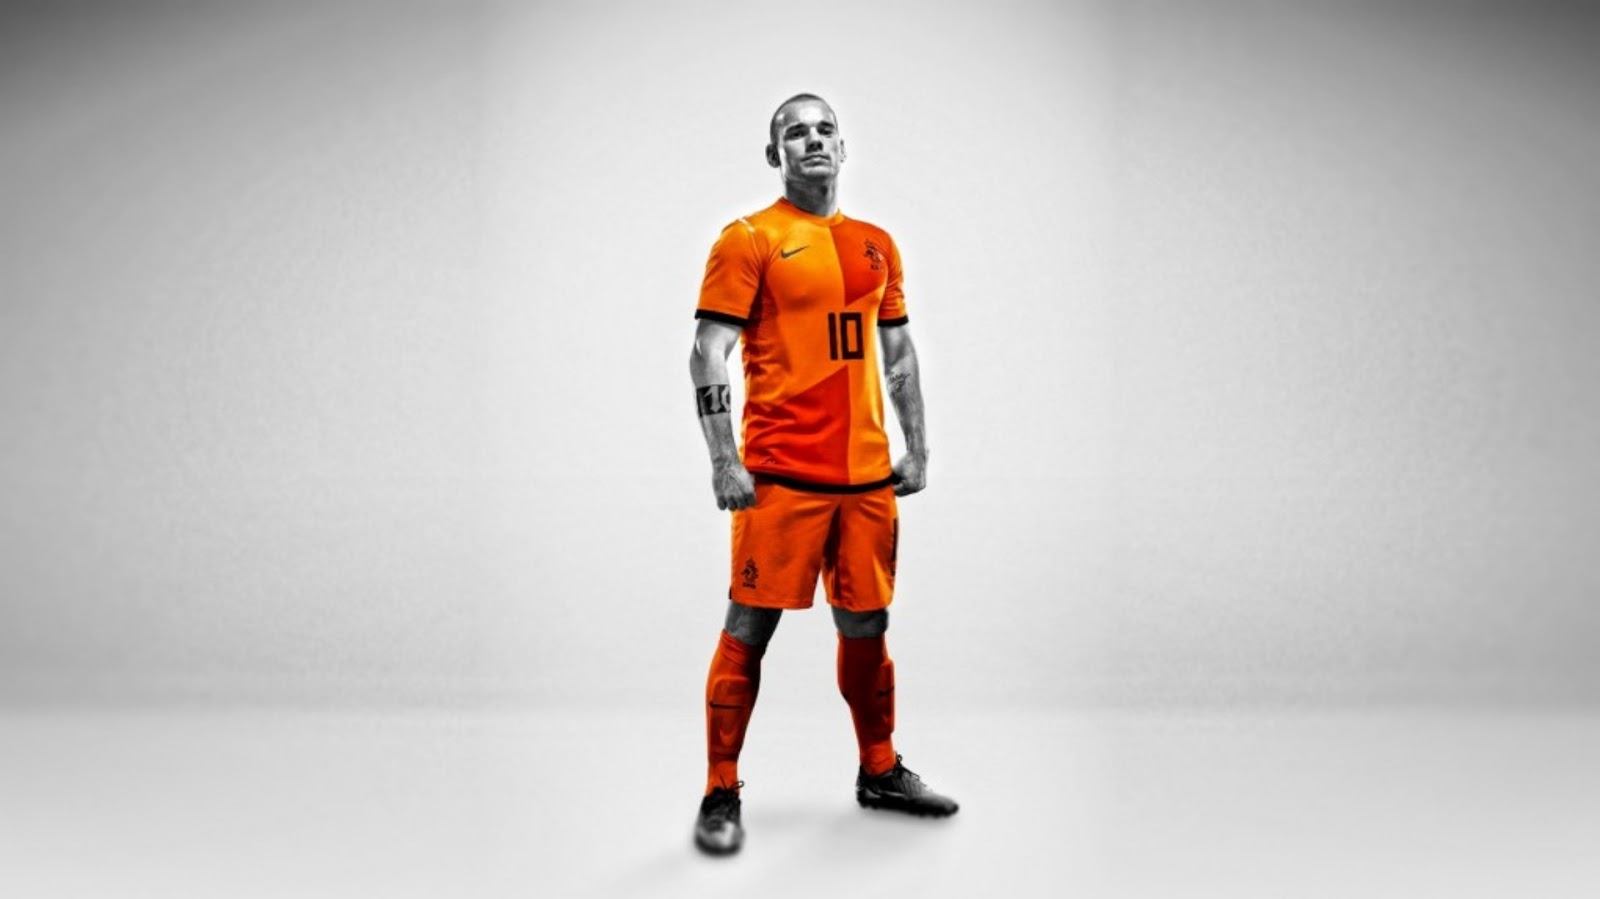 wesley+sneijder+galatasaray+resimleri+rooteto+14 Wesley Sneijder Galatasaray HD Resimleri